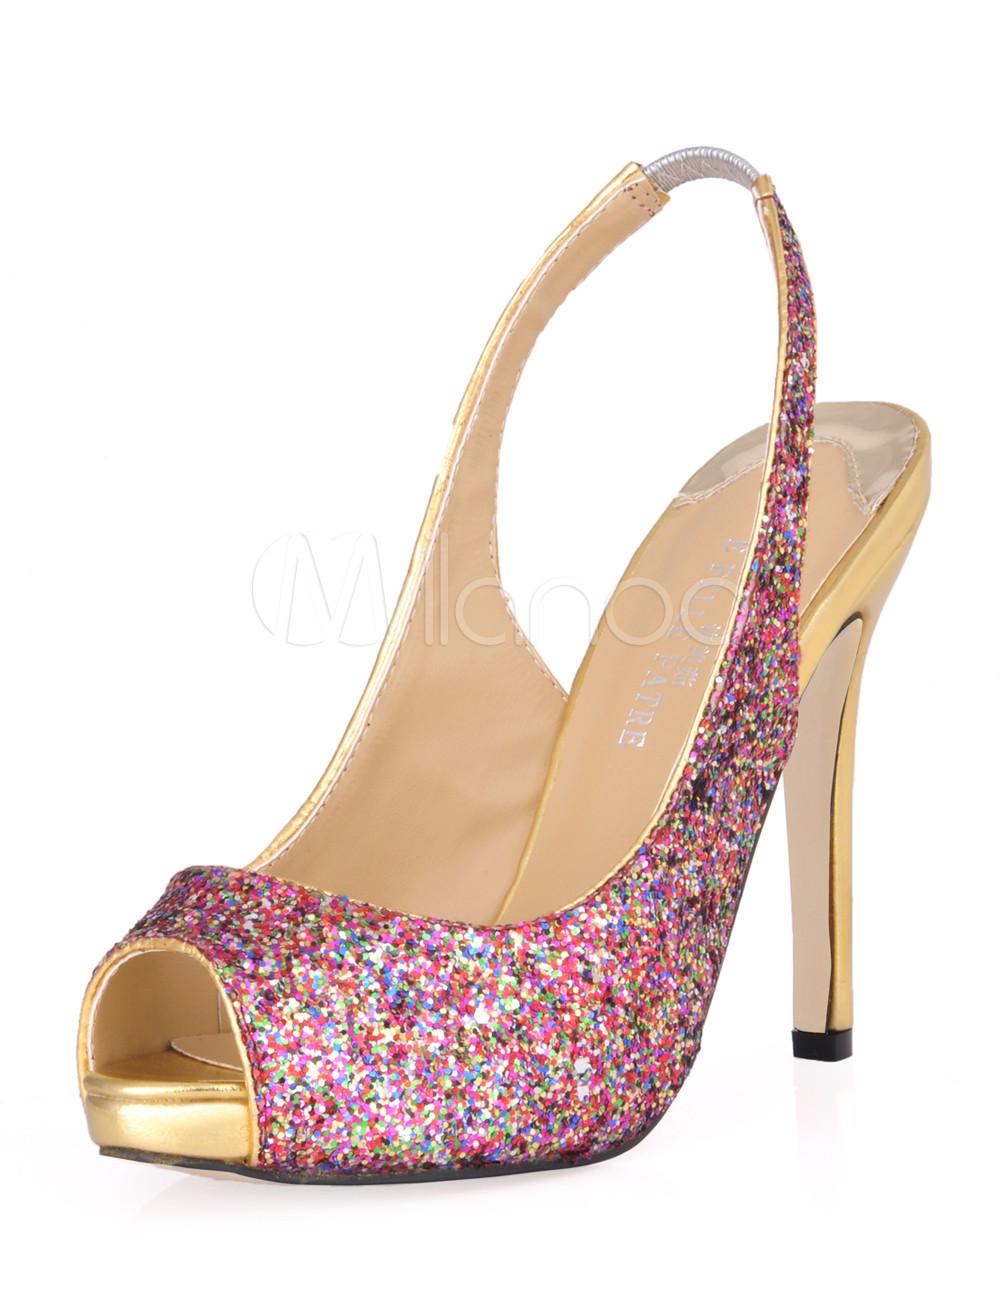 Women Dress Shoes Glitter High Heel Sandals Peep Toe Slingbacks Sandal Shoes